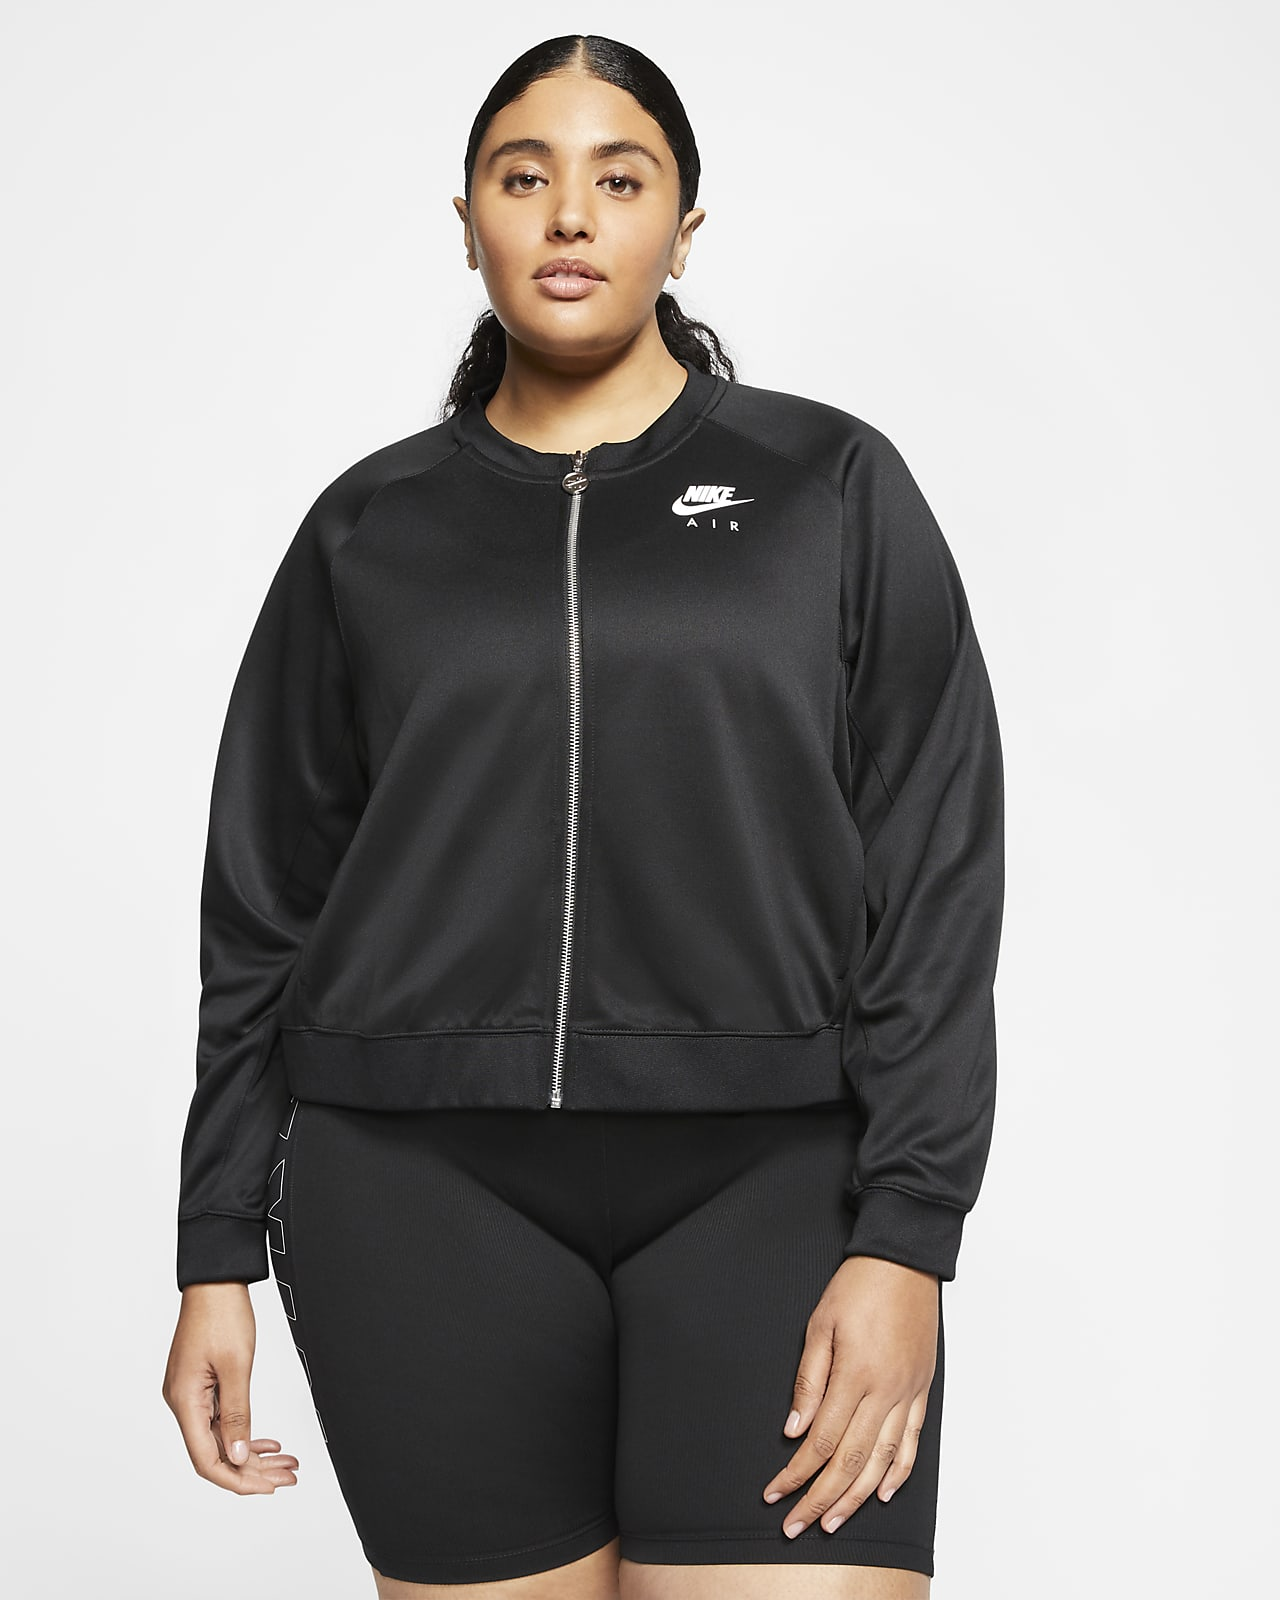 Nike Air Women's Jacket (Plus Size)